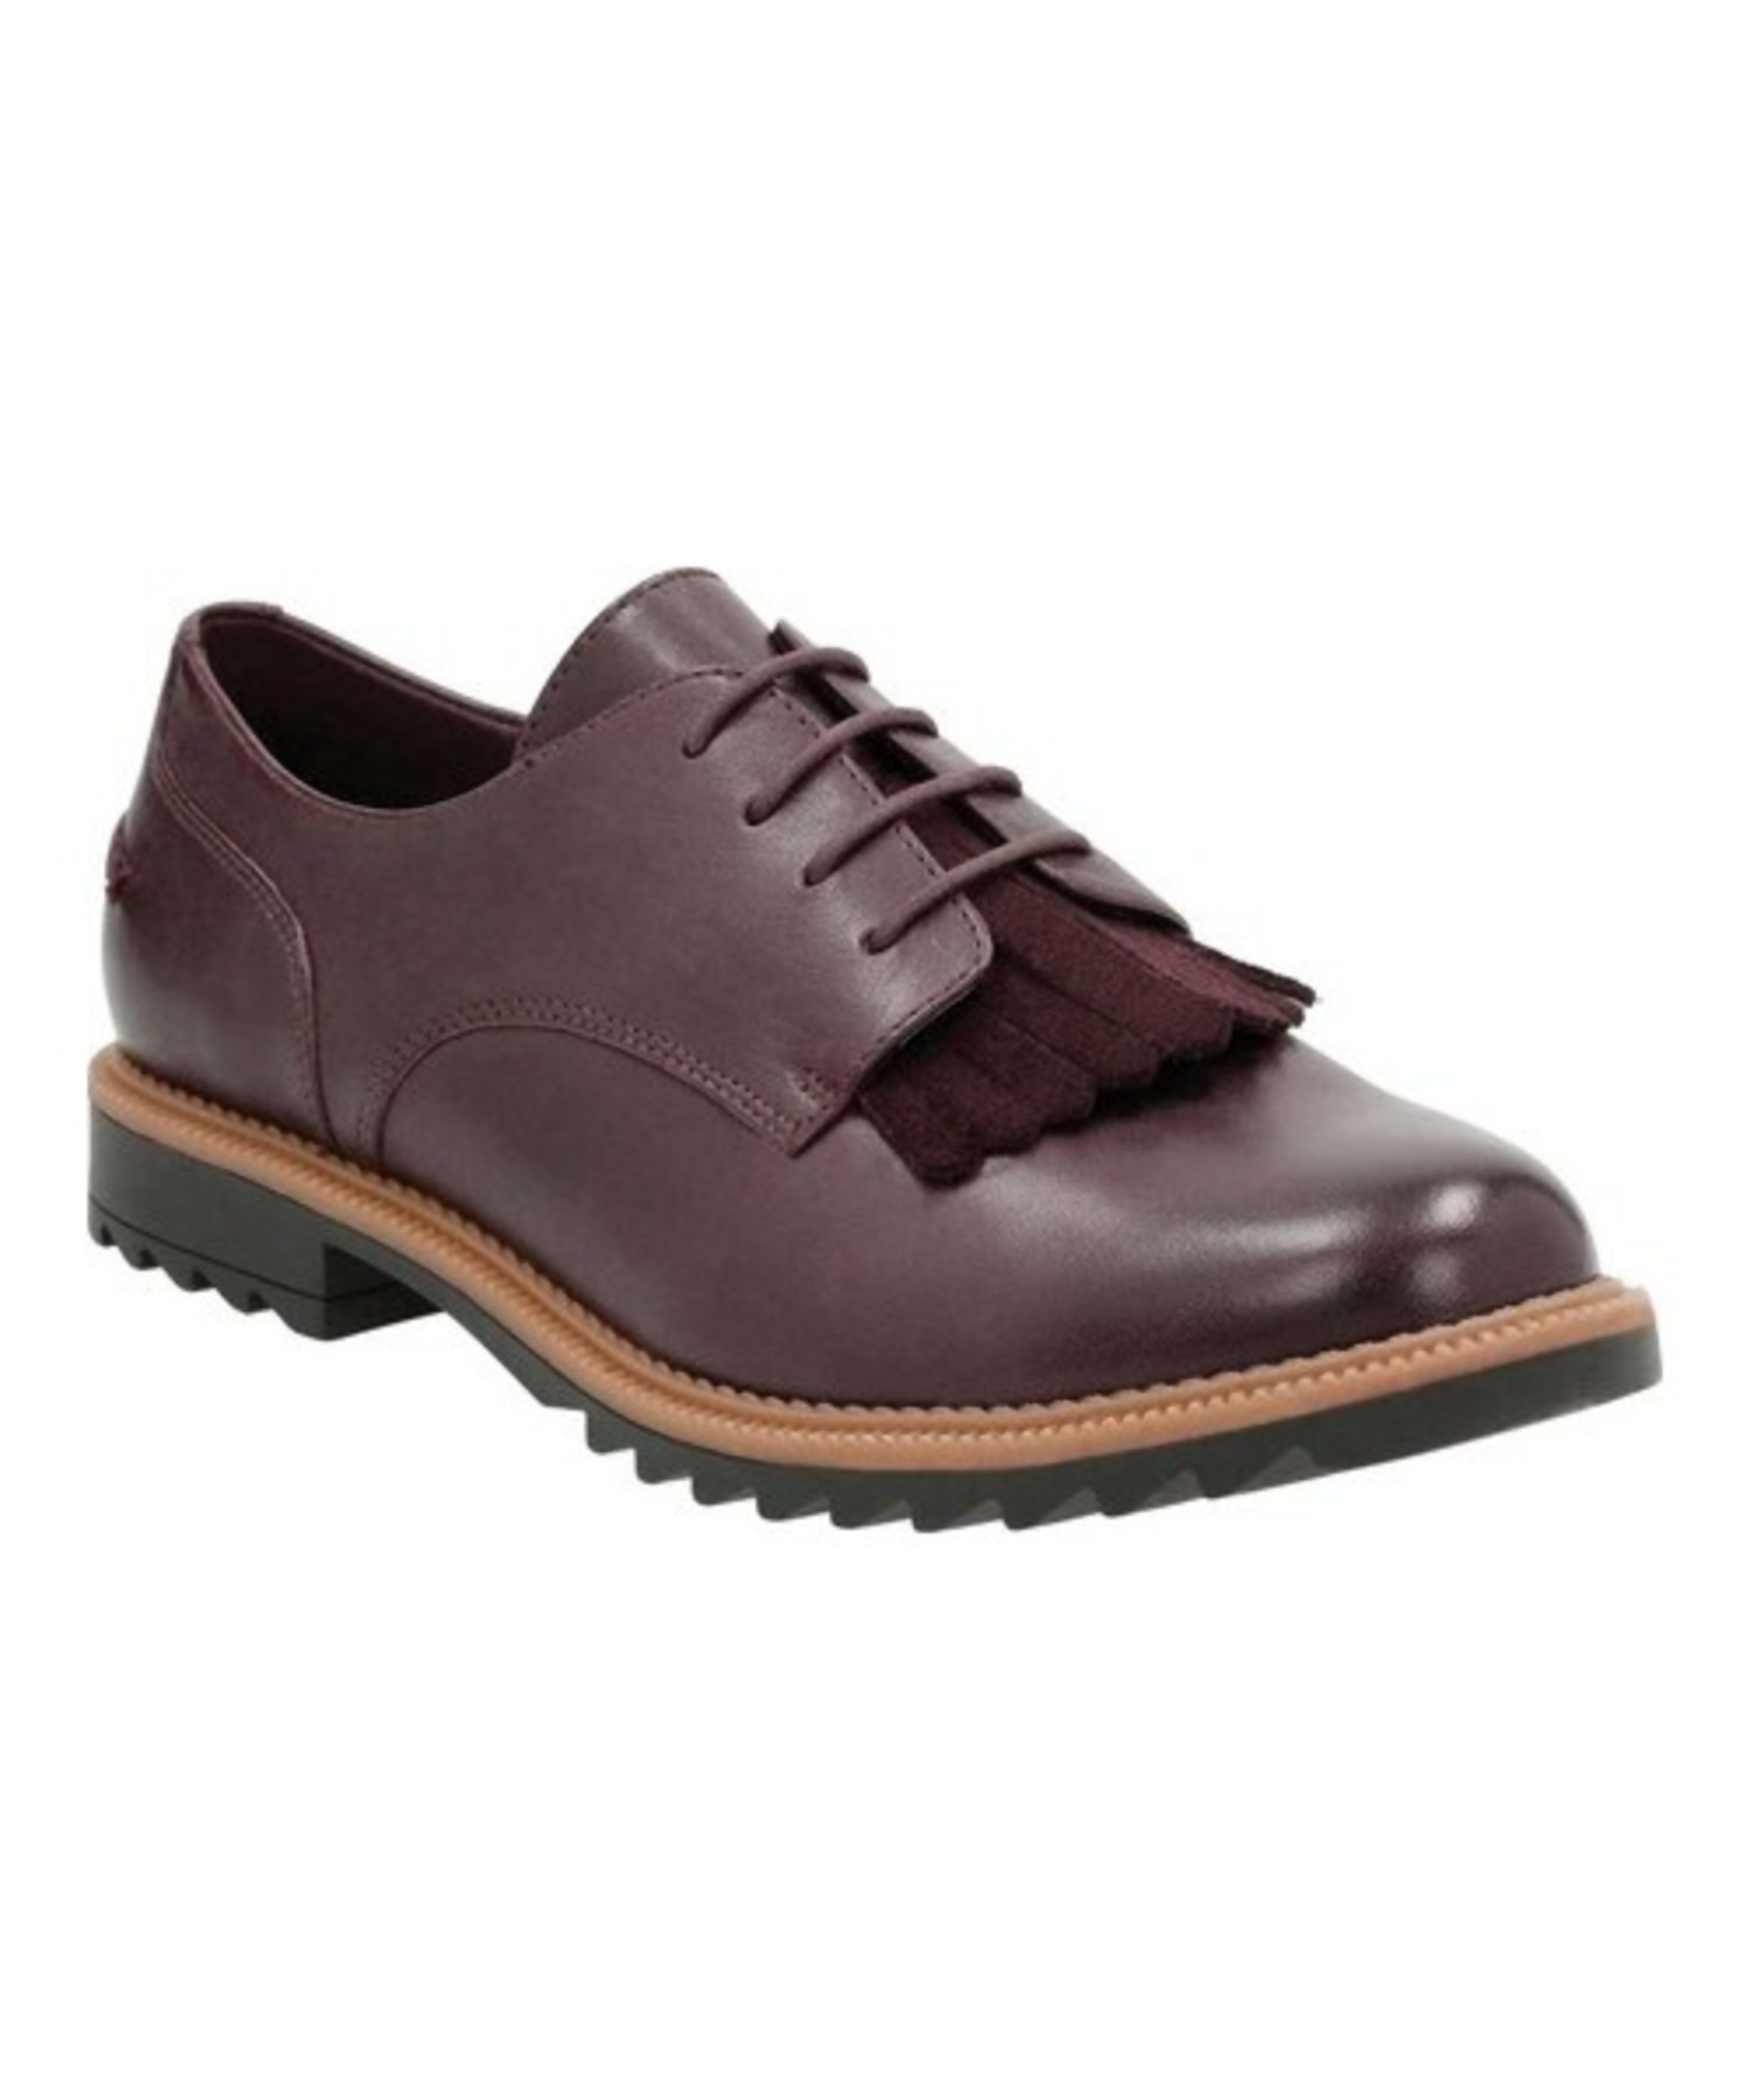 3e1ec027634 CLARKS | Clarks Women's Griffin Mabel Oxford #Shoes #Sneakers #CLARKS